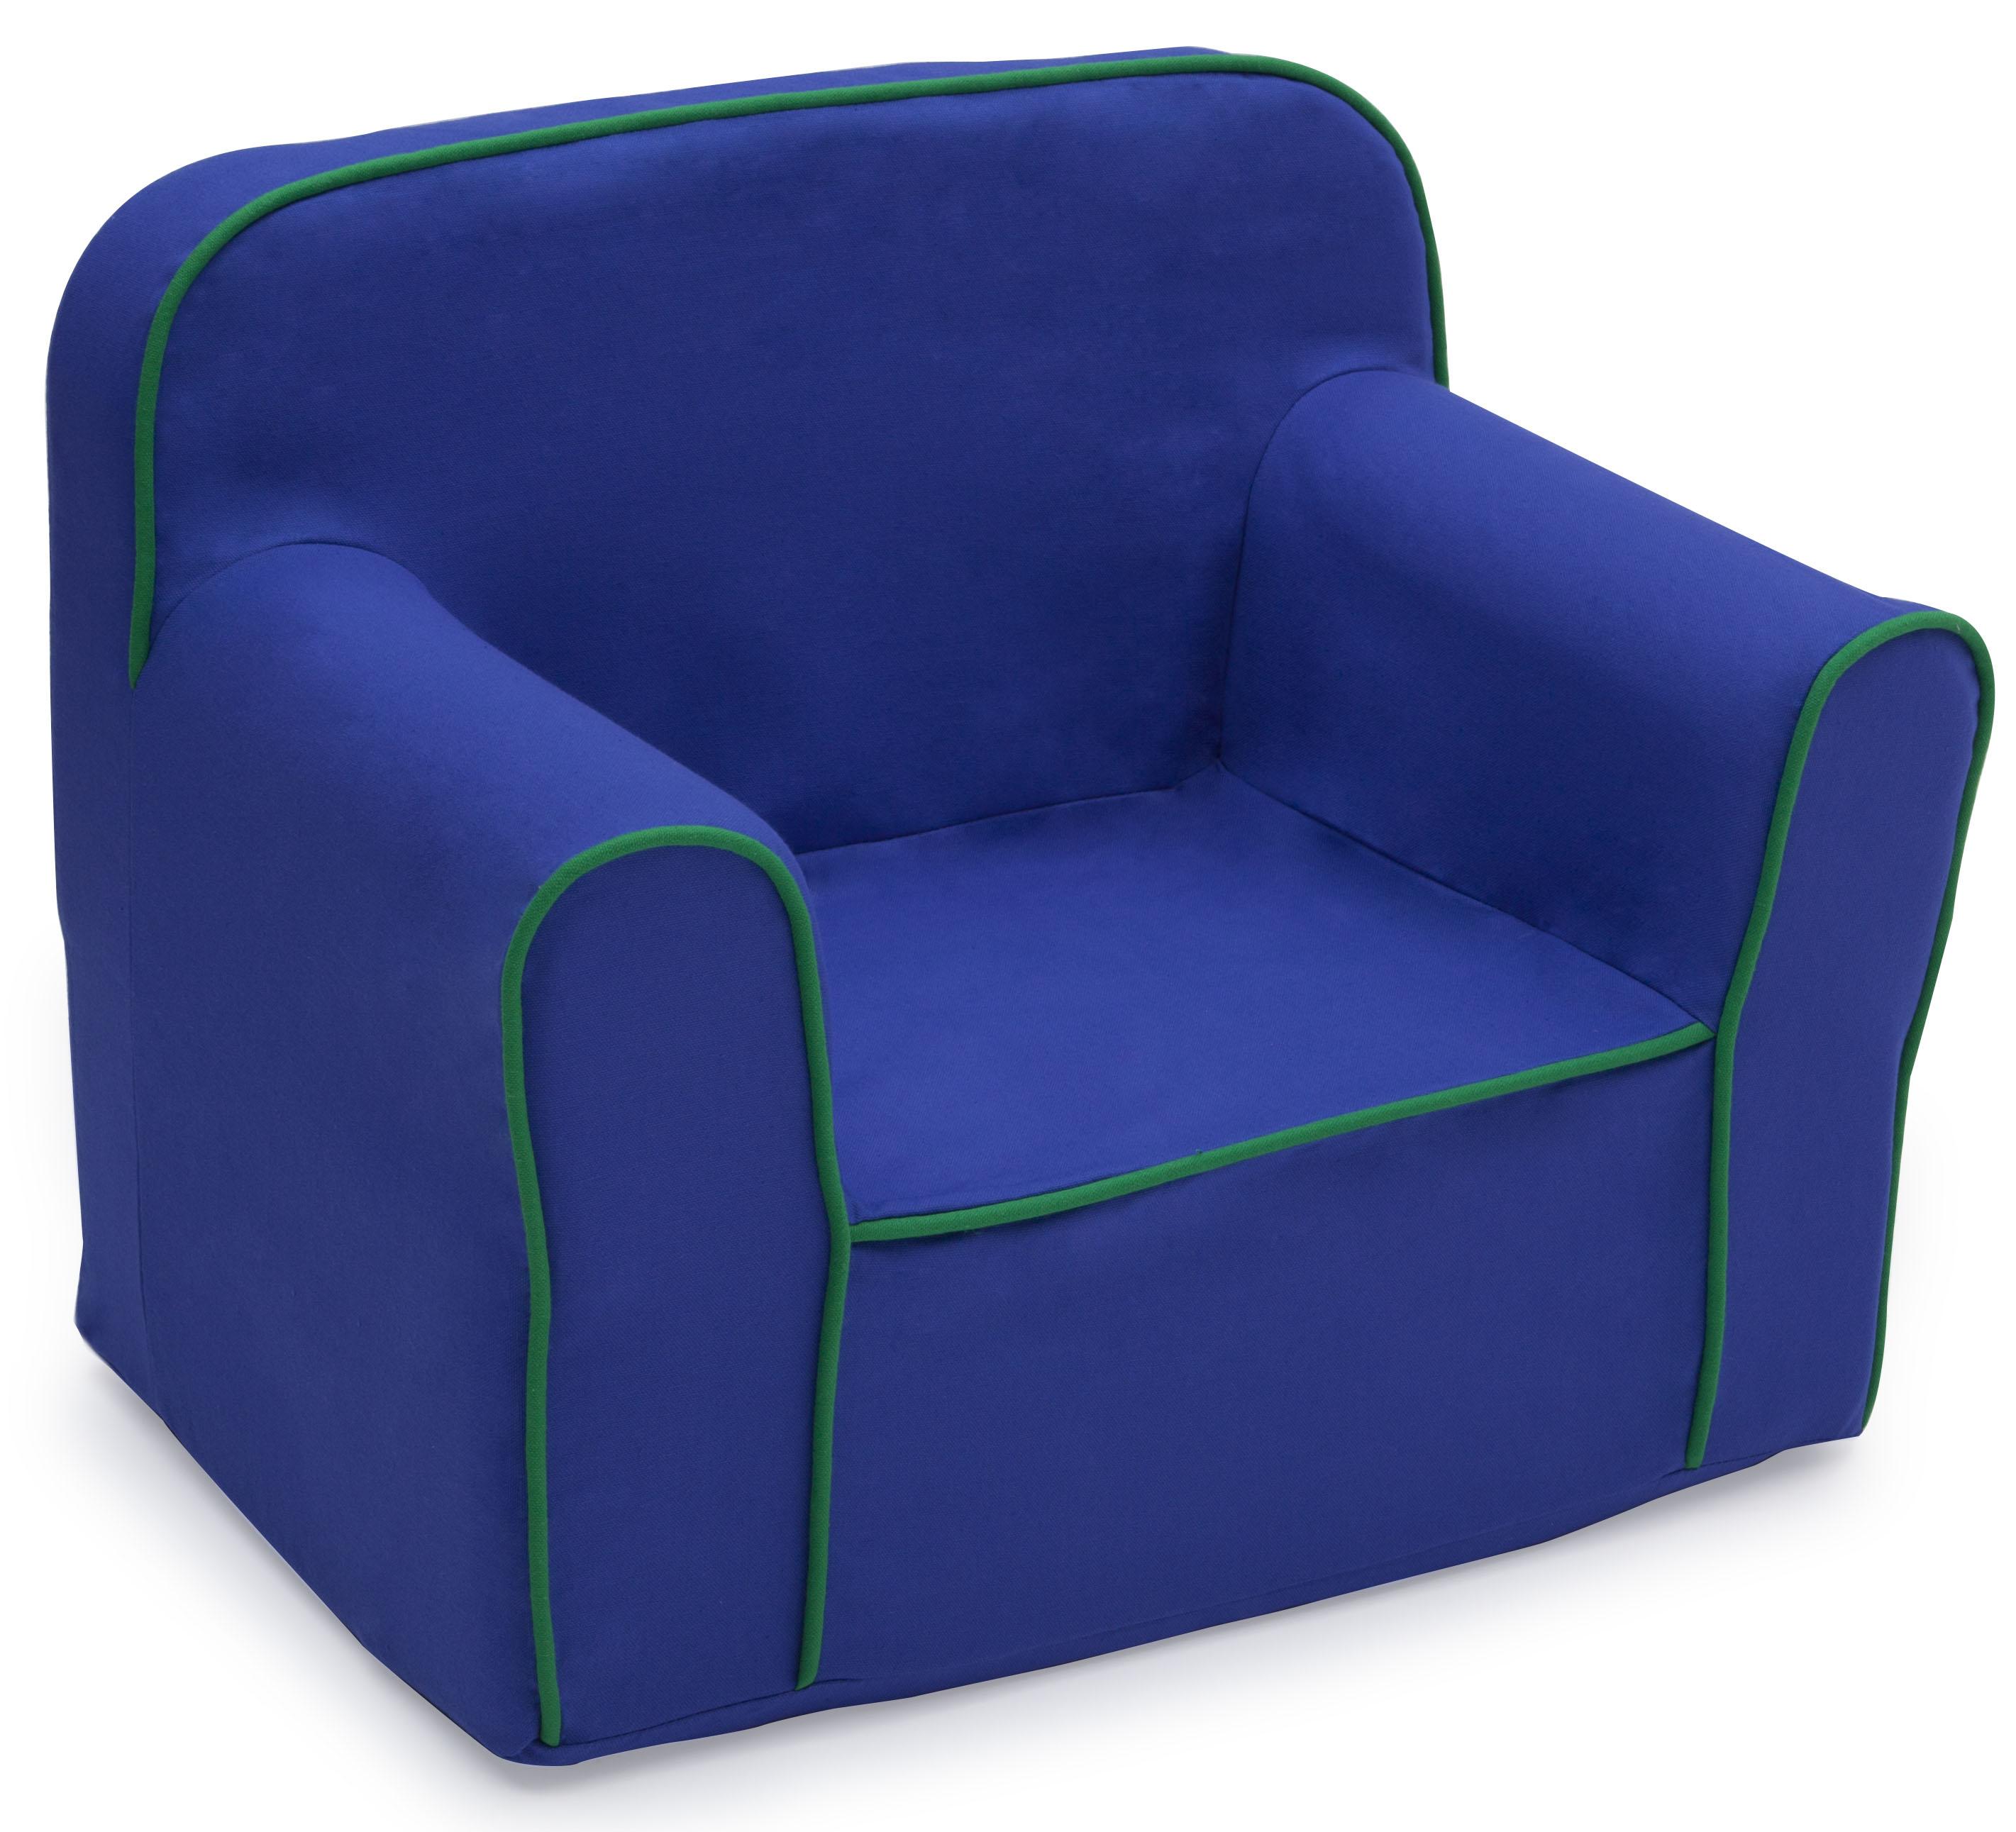 toddler foam chair target saucer delta children snuggle blue